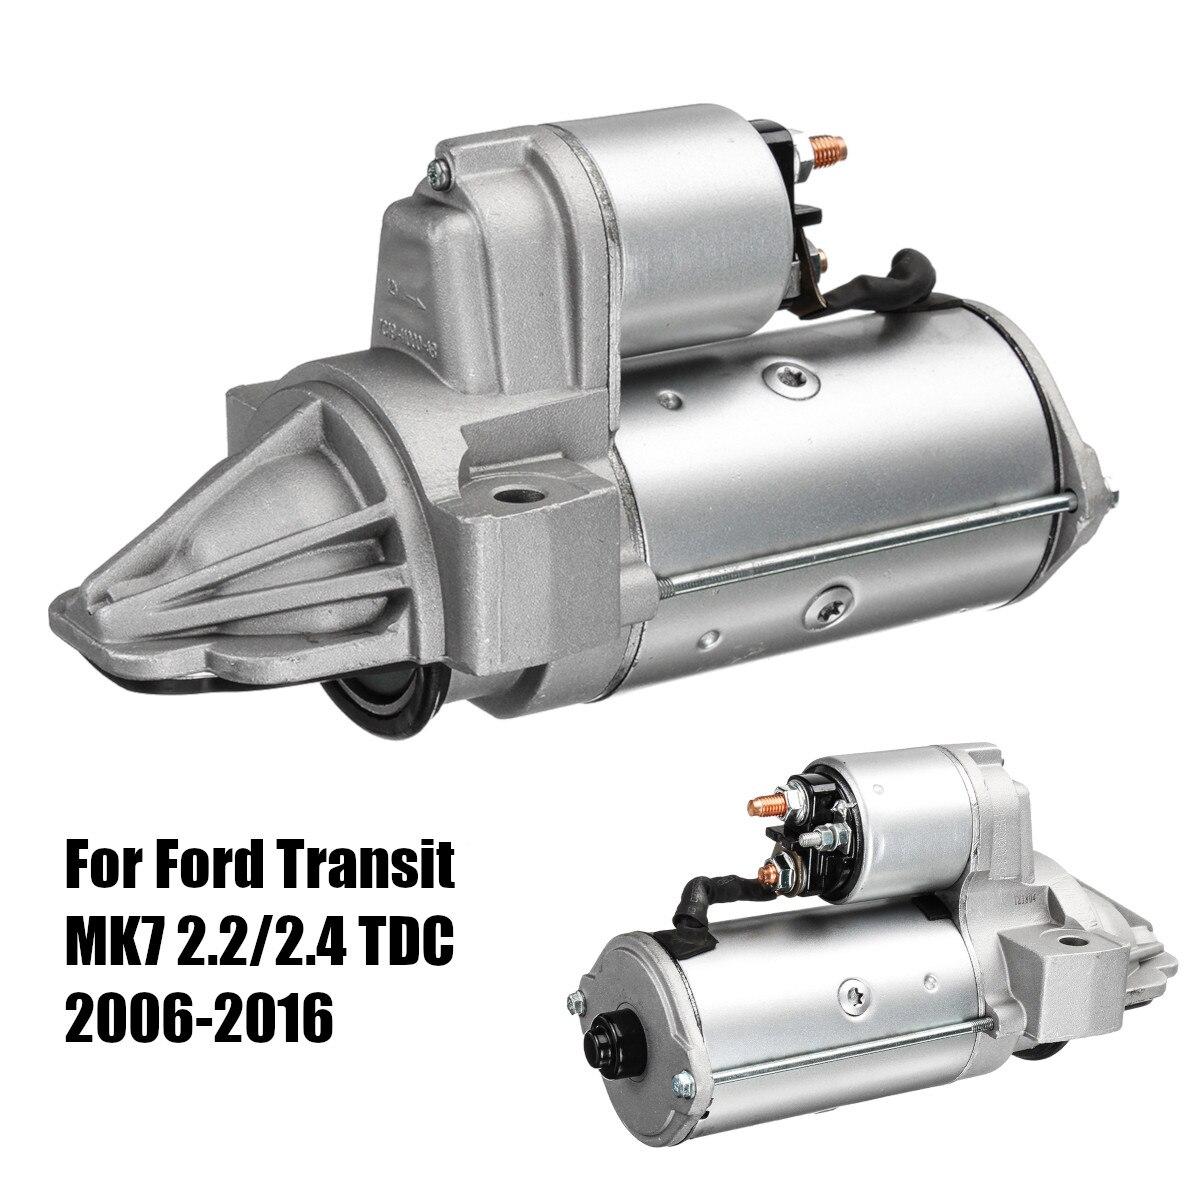 Electric Starter Motor 0001109205, 0001109305, 0001109324, 0001109325 For For FORD TRANSIT MK7 2.2/2.4 TDC 2006-2016